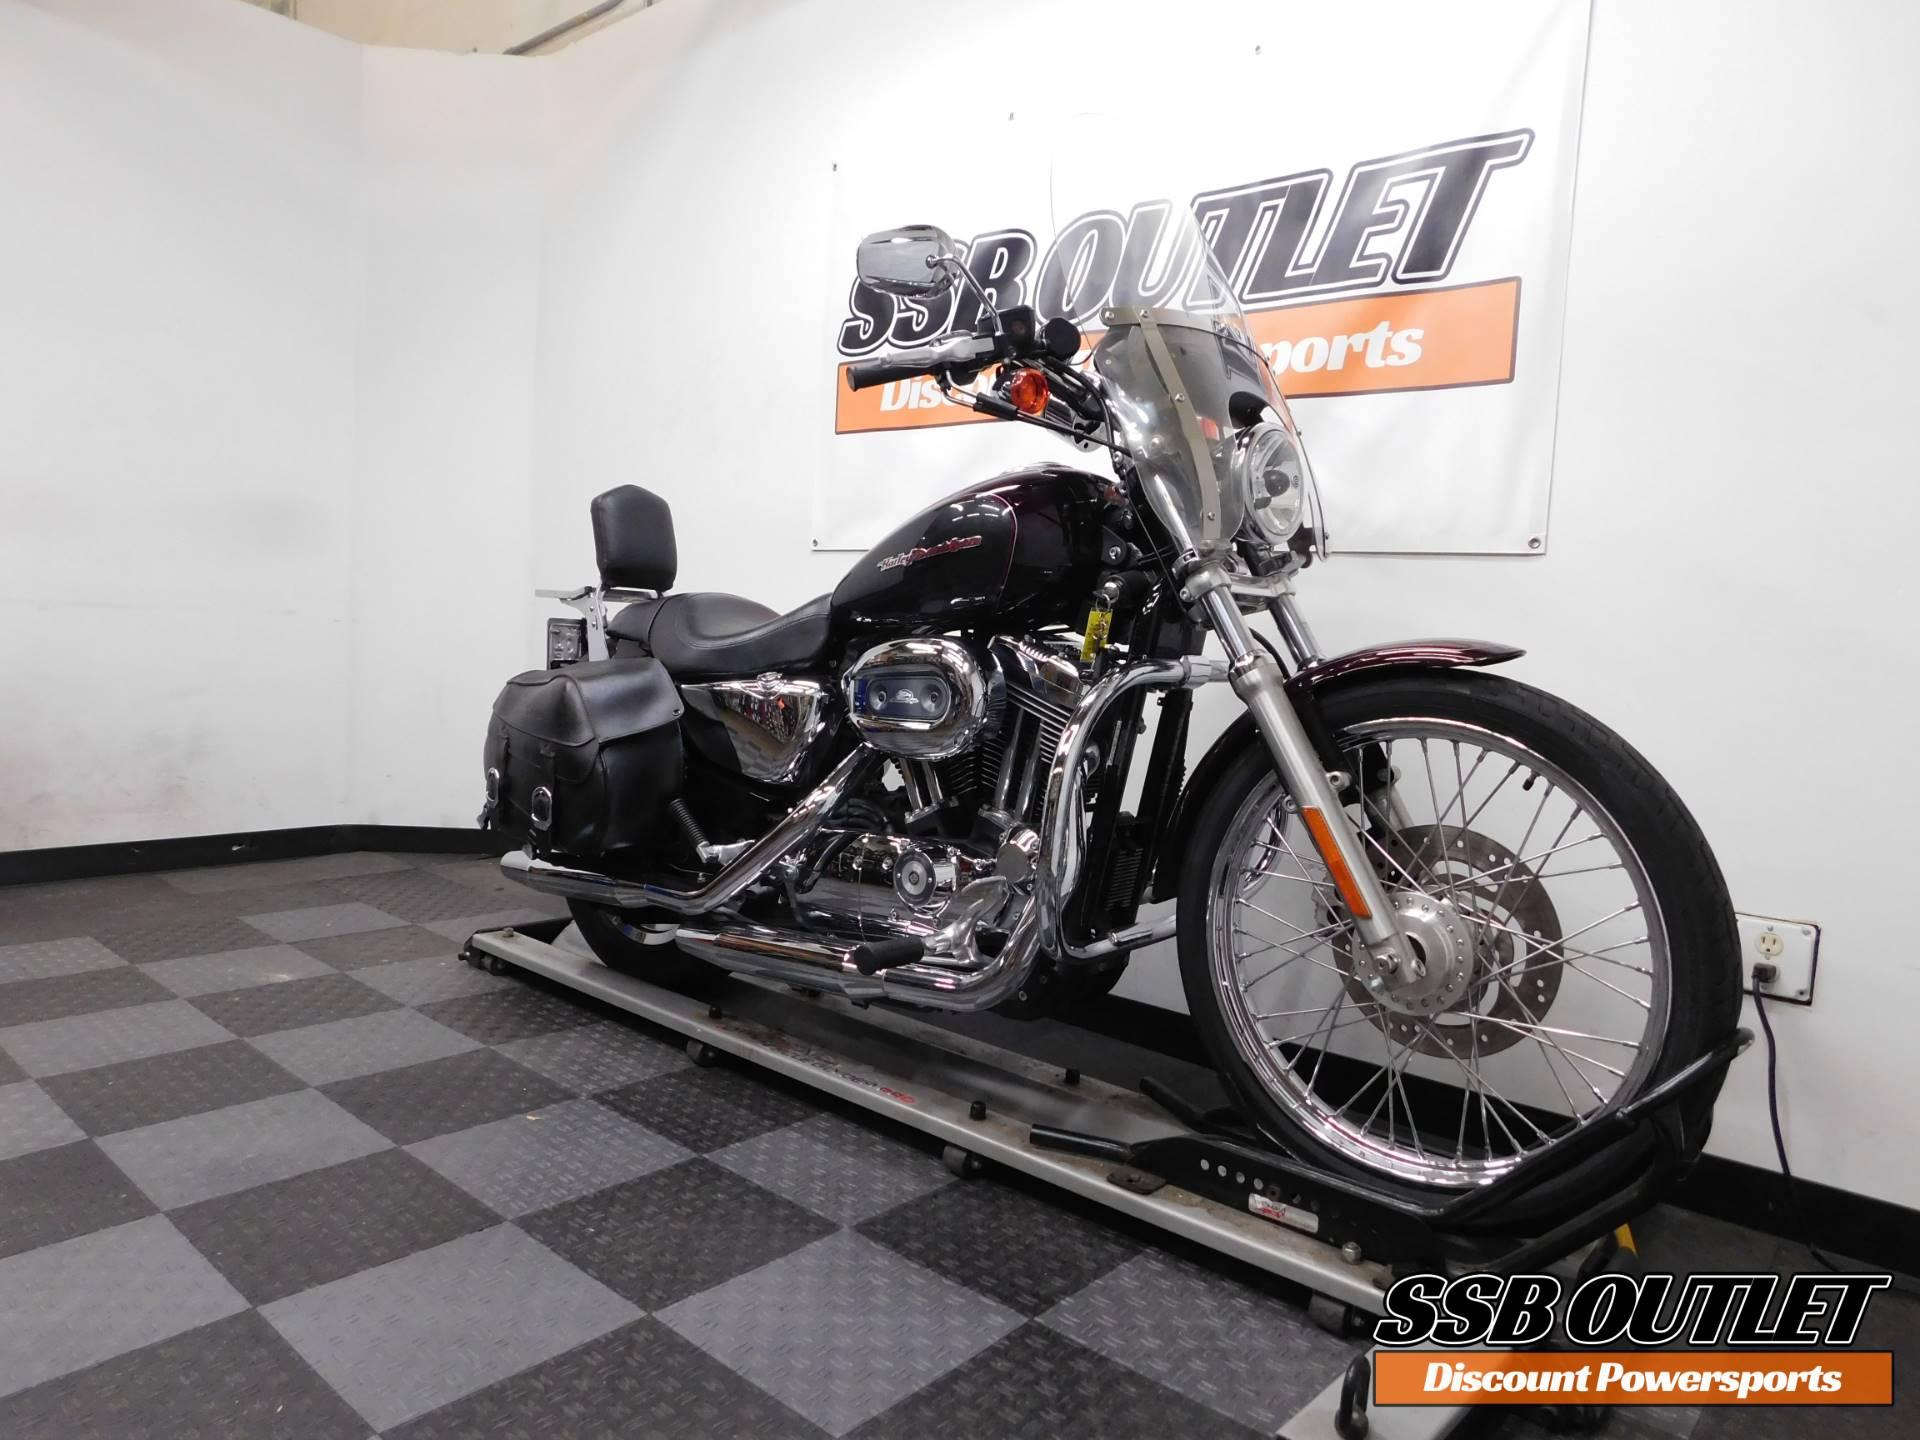 2006 Harley-Davidson Sportster 1200 Custom 2